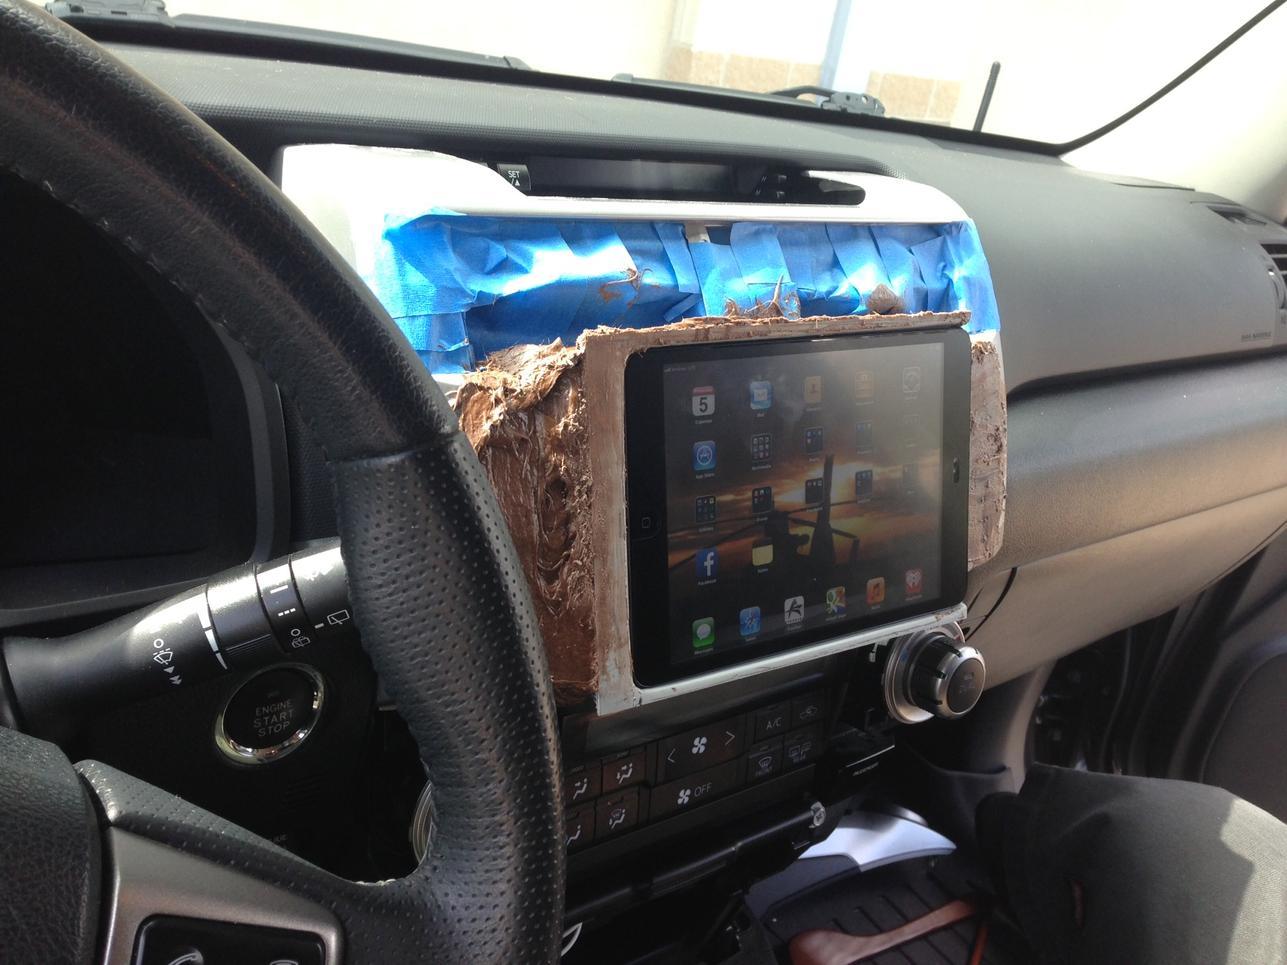 iPad Mini In Dash? - Page 3 - Toyota 4Runner Forum ...